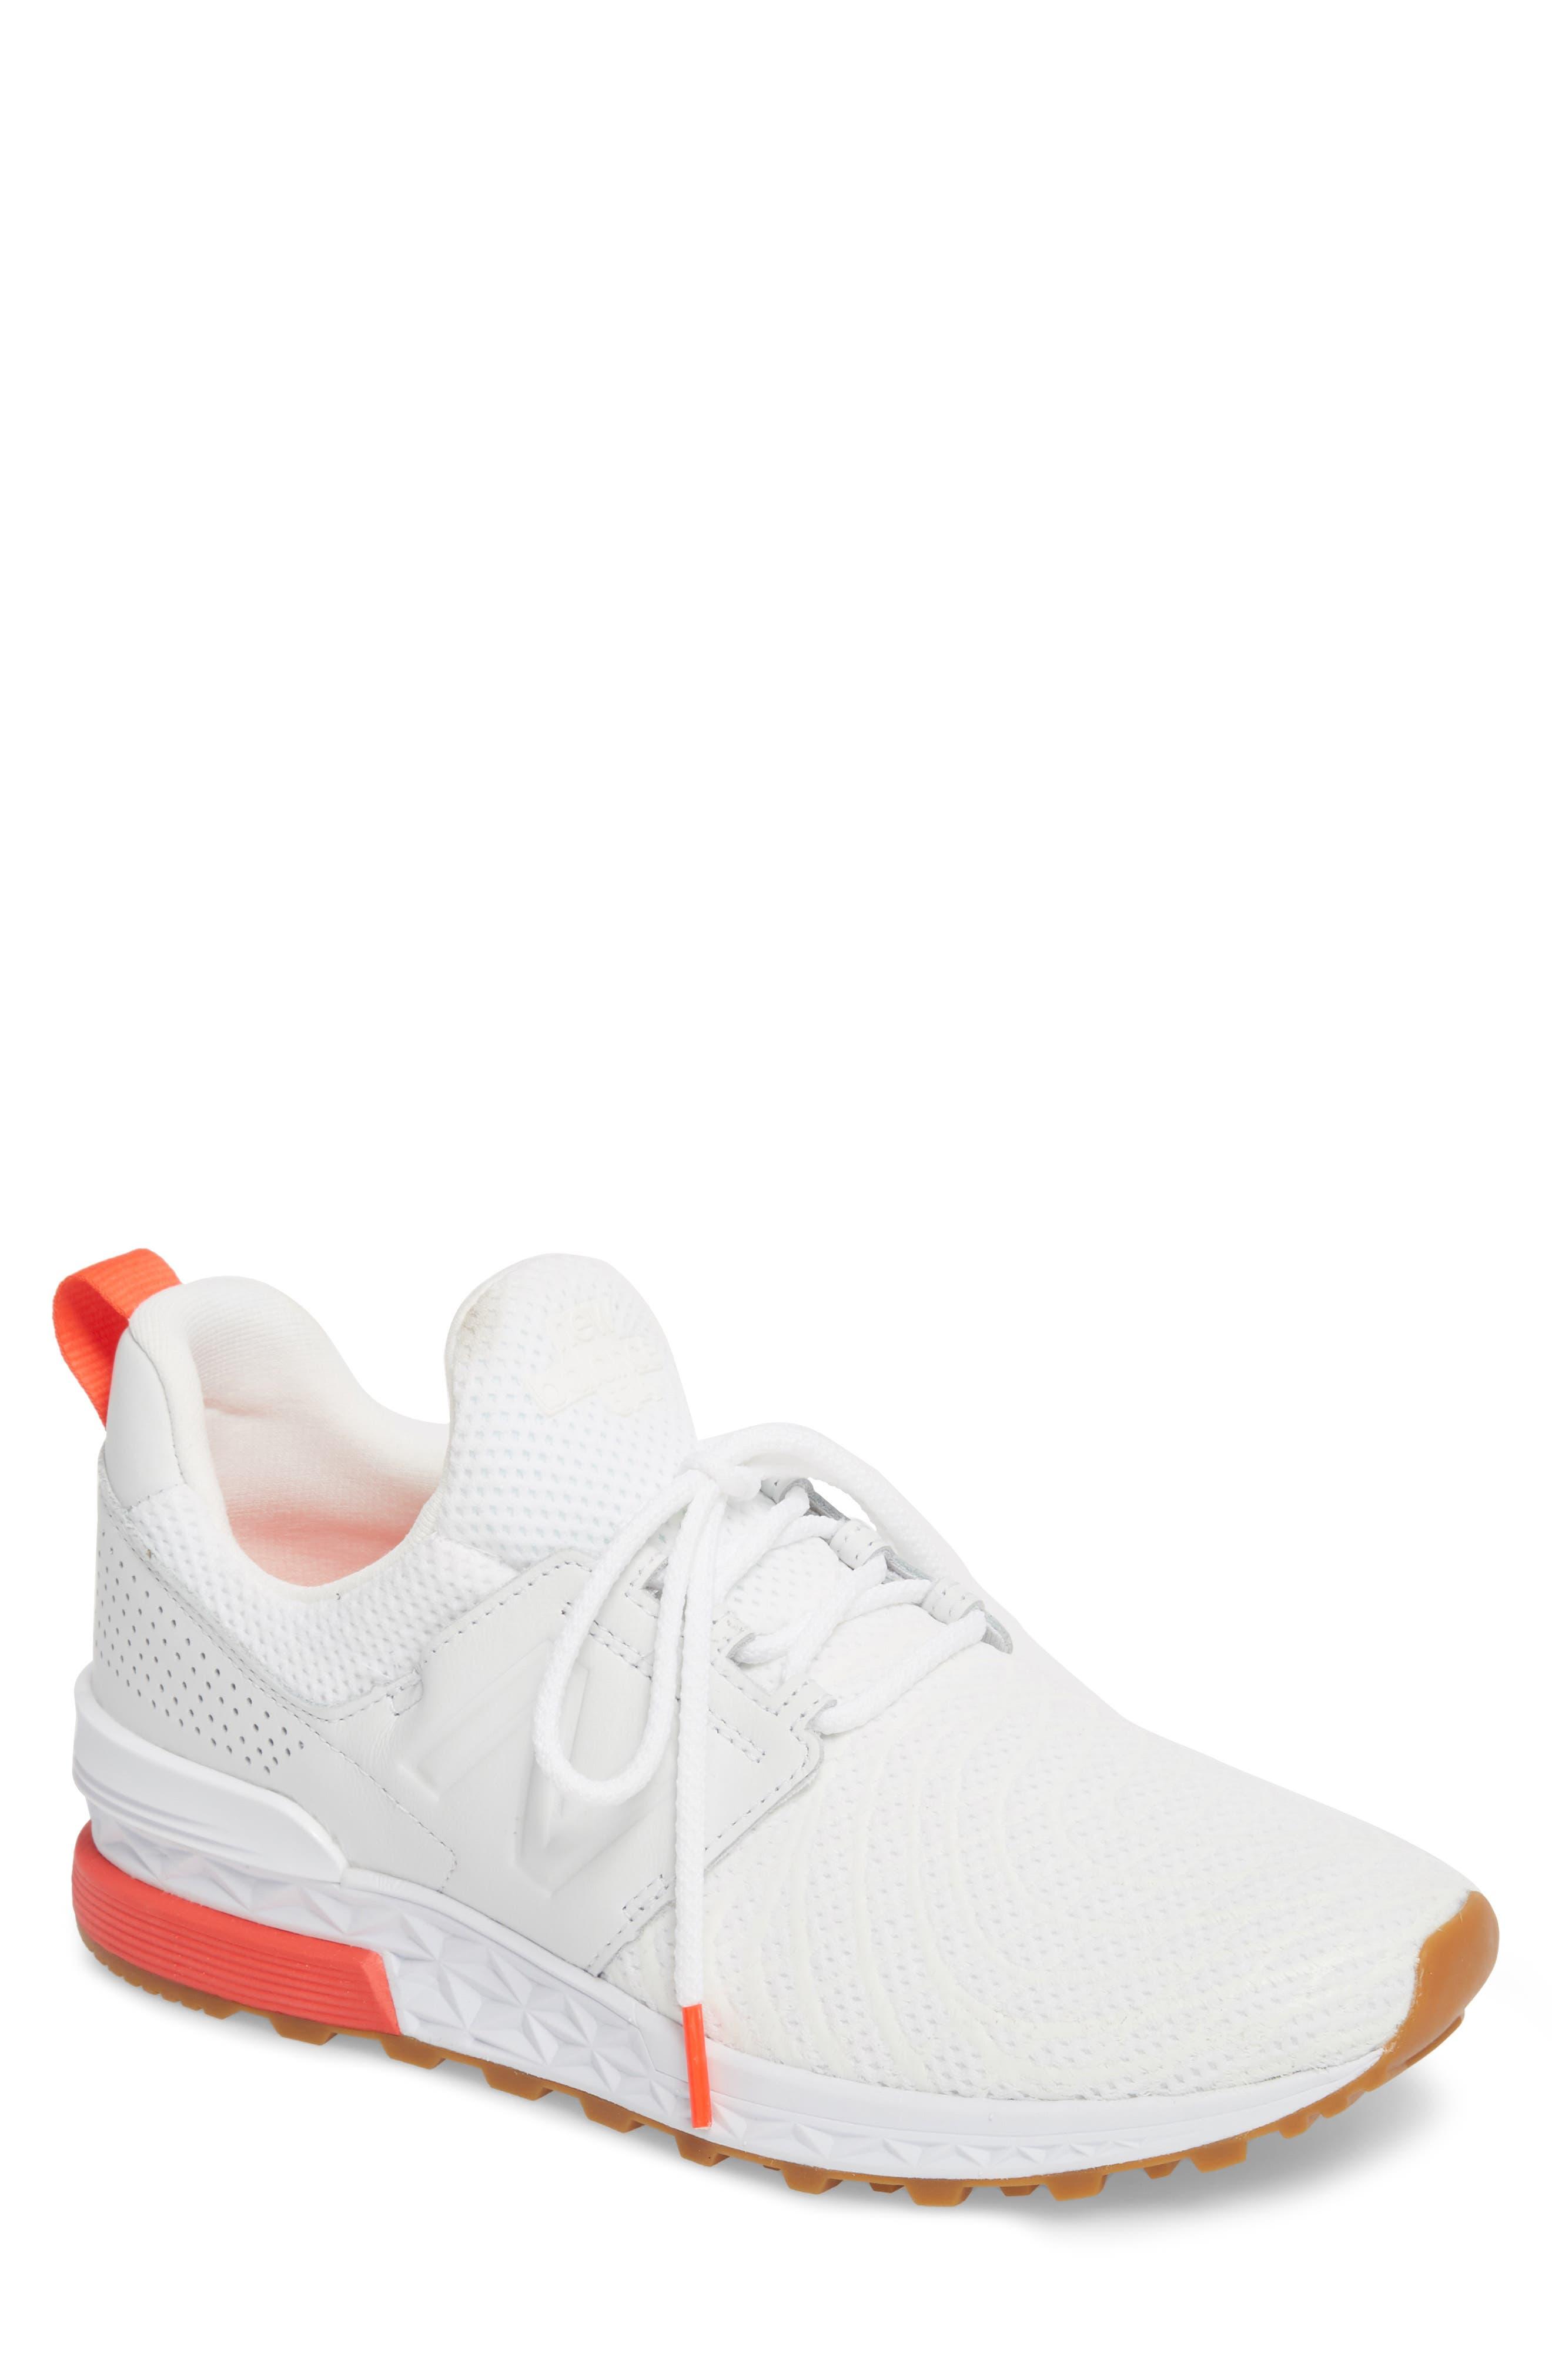 574 Sport Sneaker,                             Main thumbnail 1, color,                             WHITE